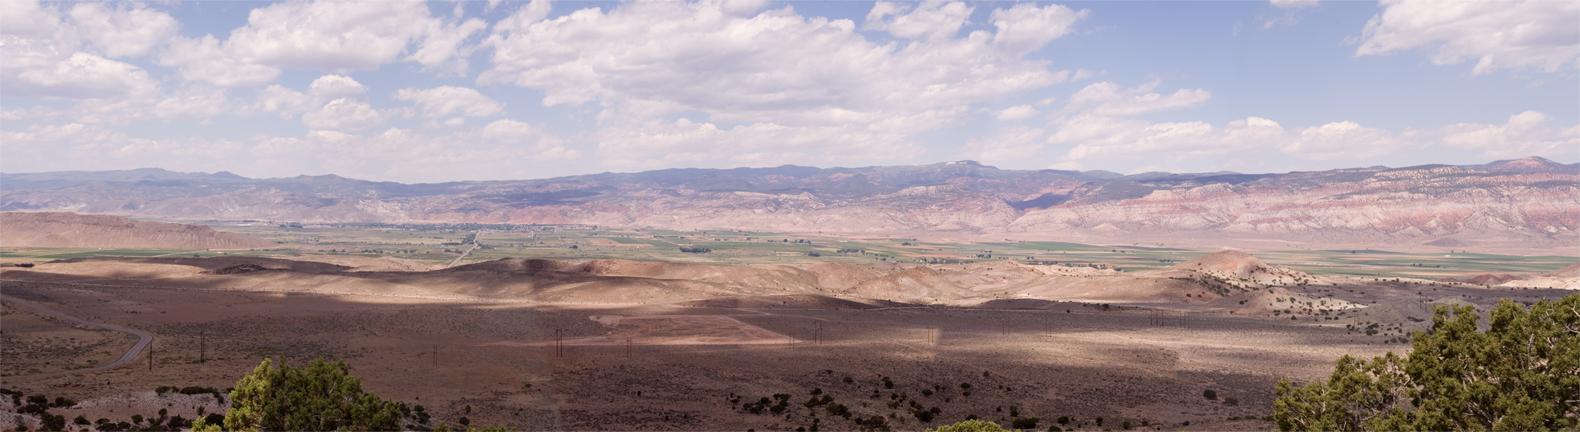 Richfield Utah.jpg